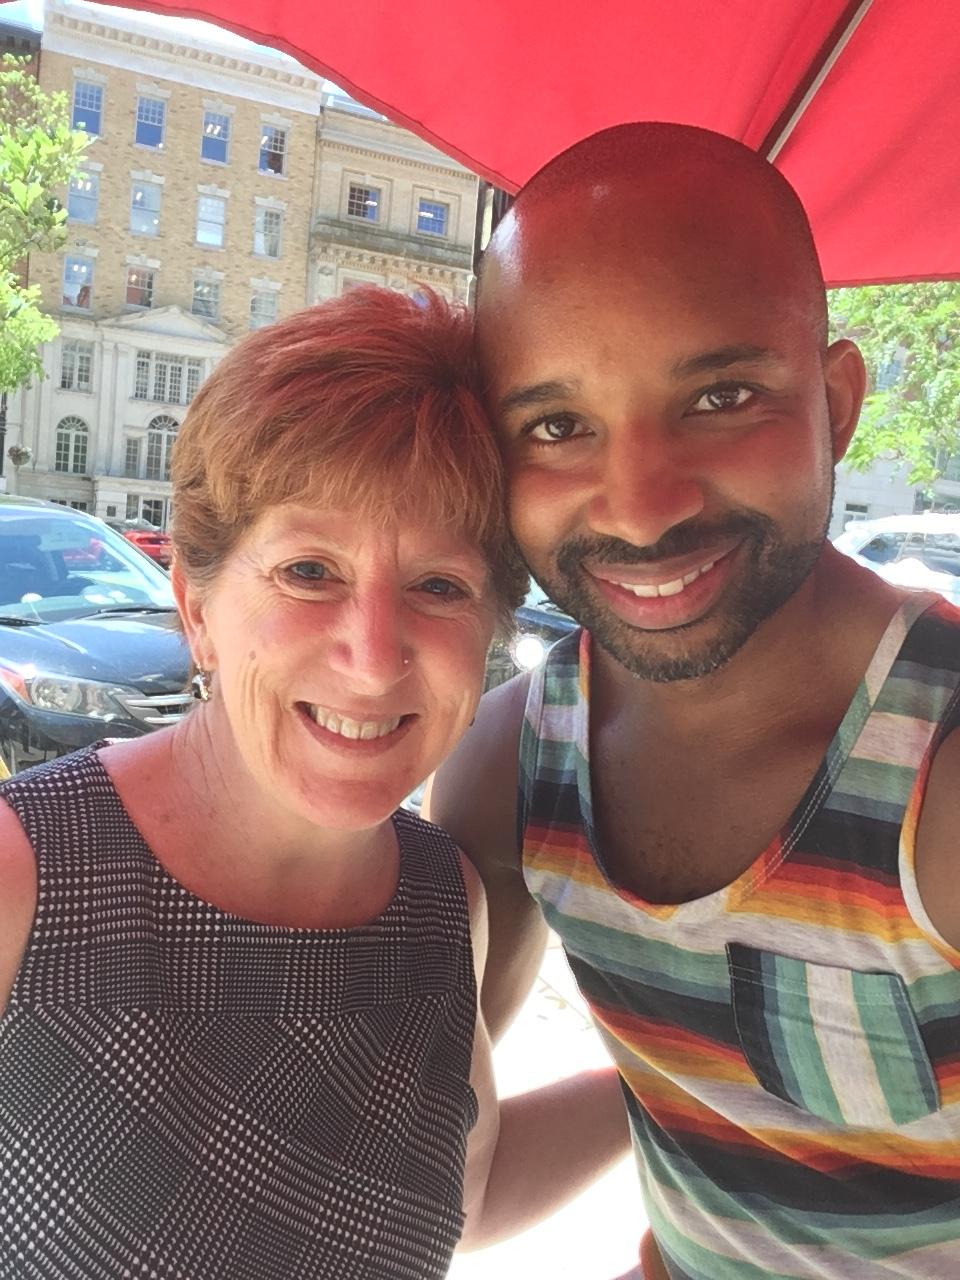 Me with Kathy Sheehan: Mayor of Albany, NY.